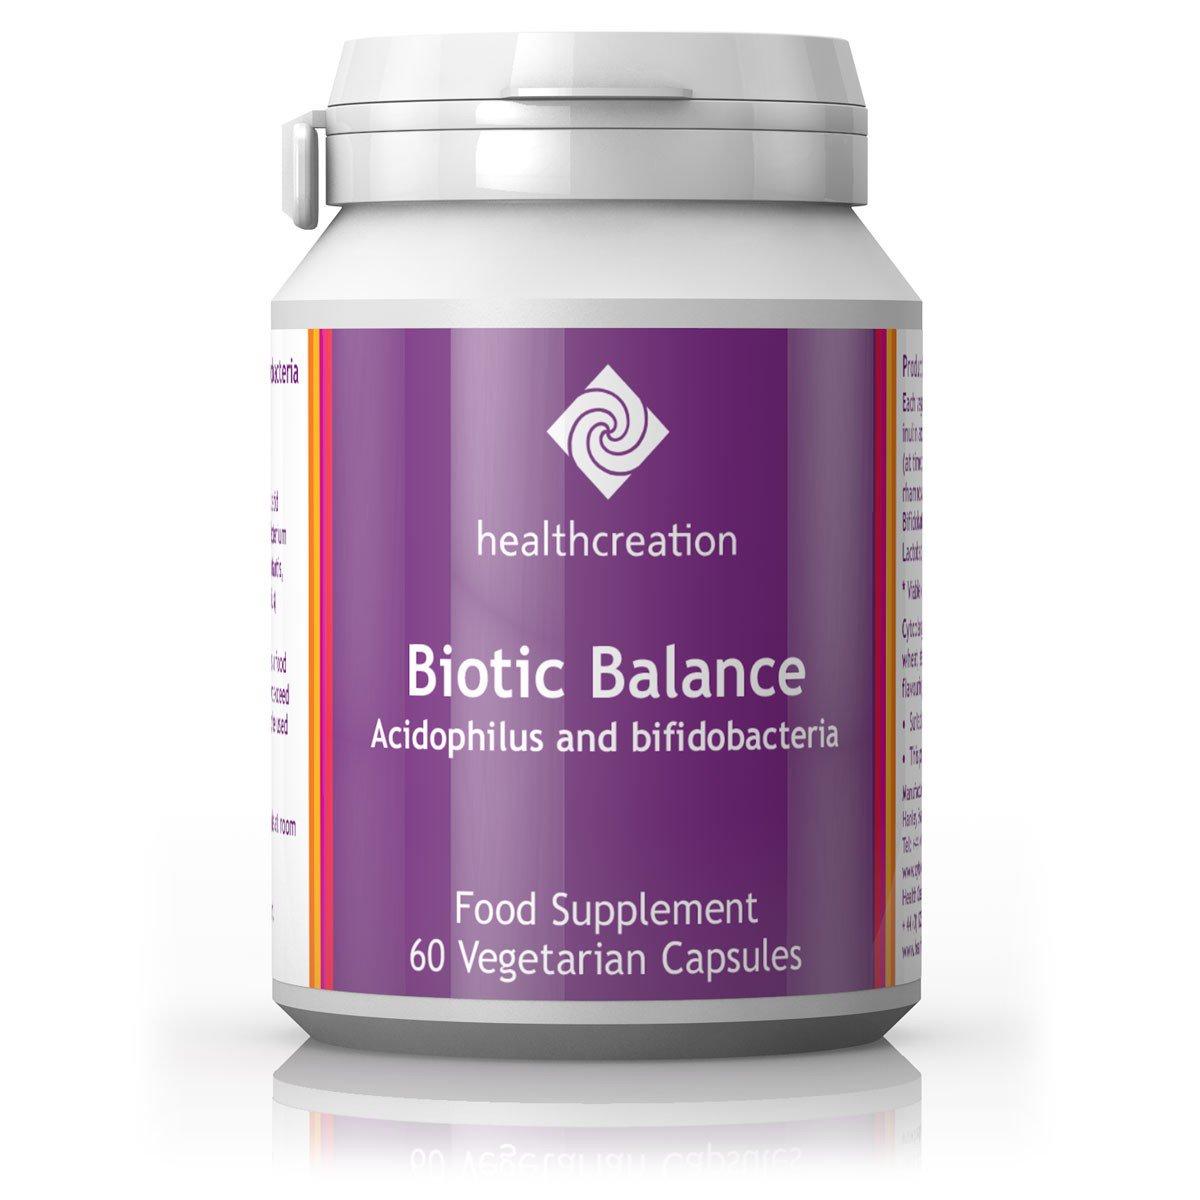 Health Creation Biotic Balance 60's